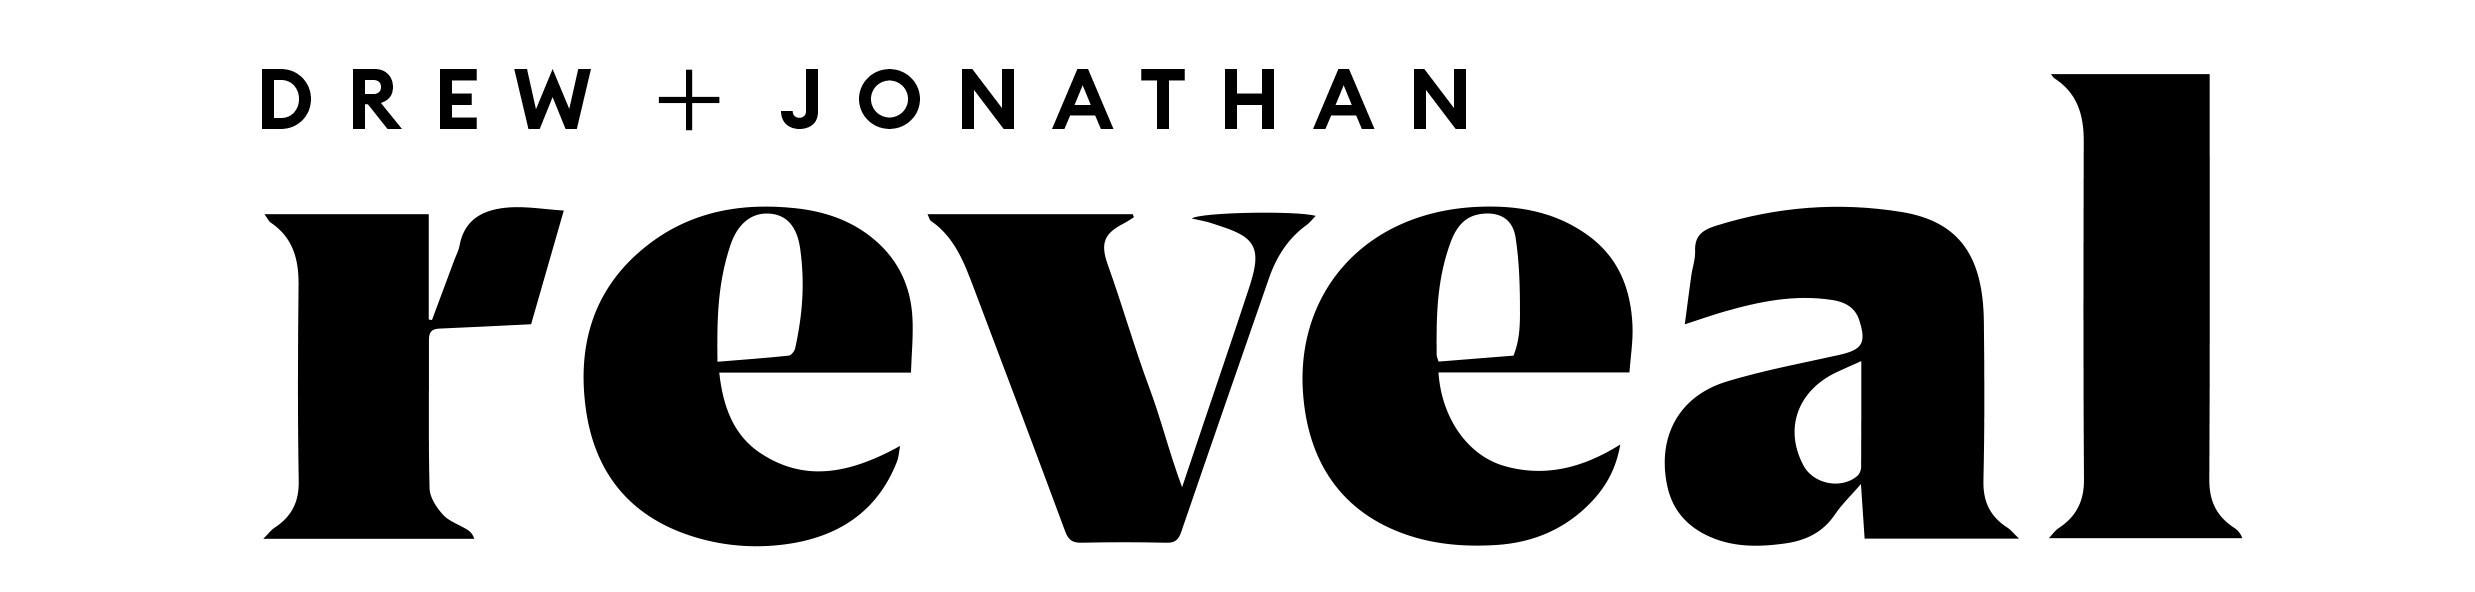 Drew + Jonathan Reveal Magazine